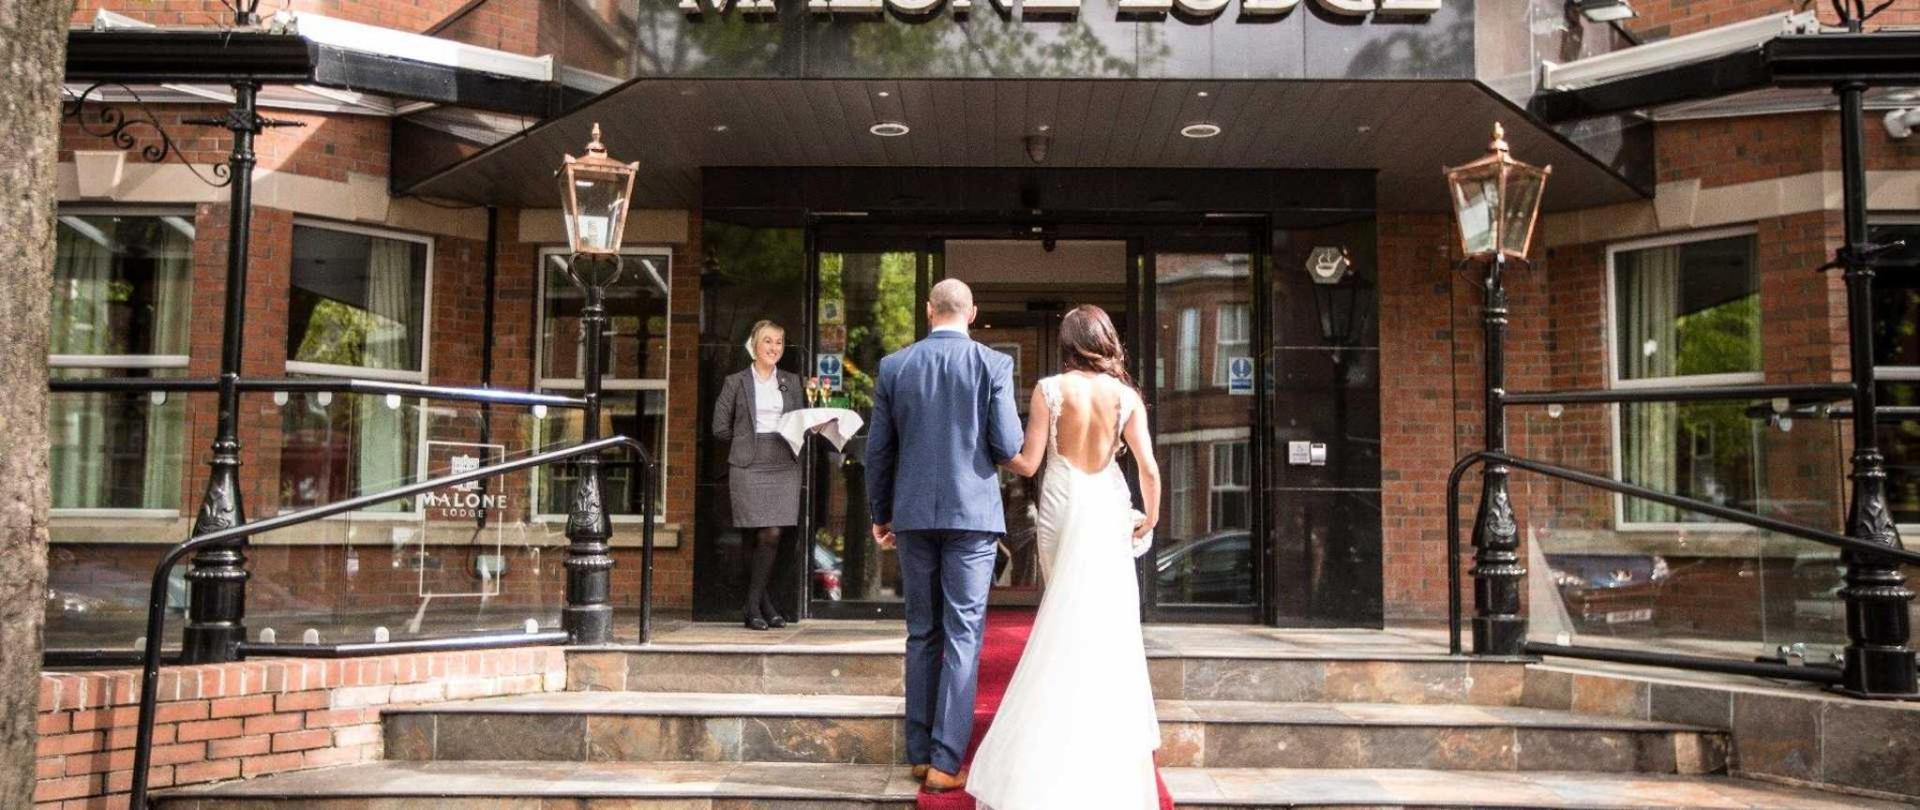 malone-lodge-hotel-belfast-weddings-08.jpg.1920x810_default.jpeg